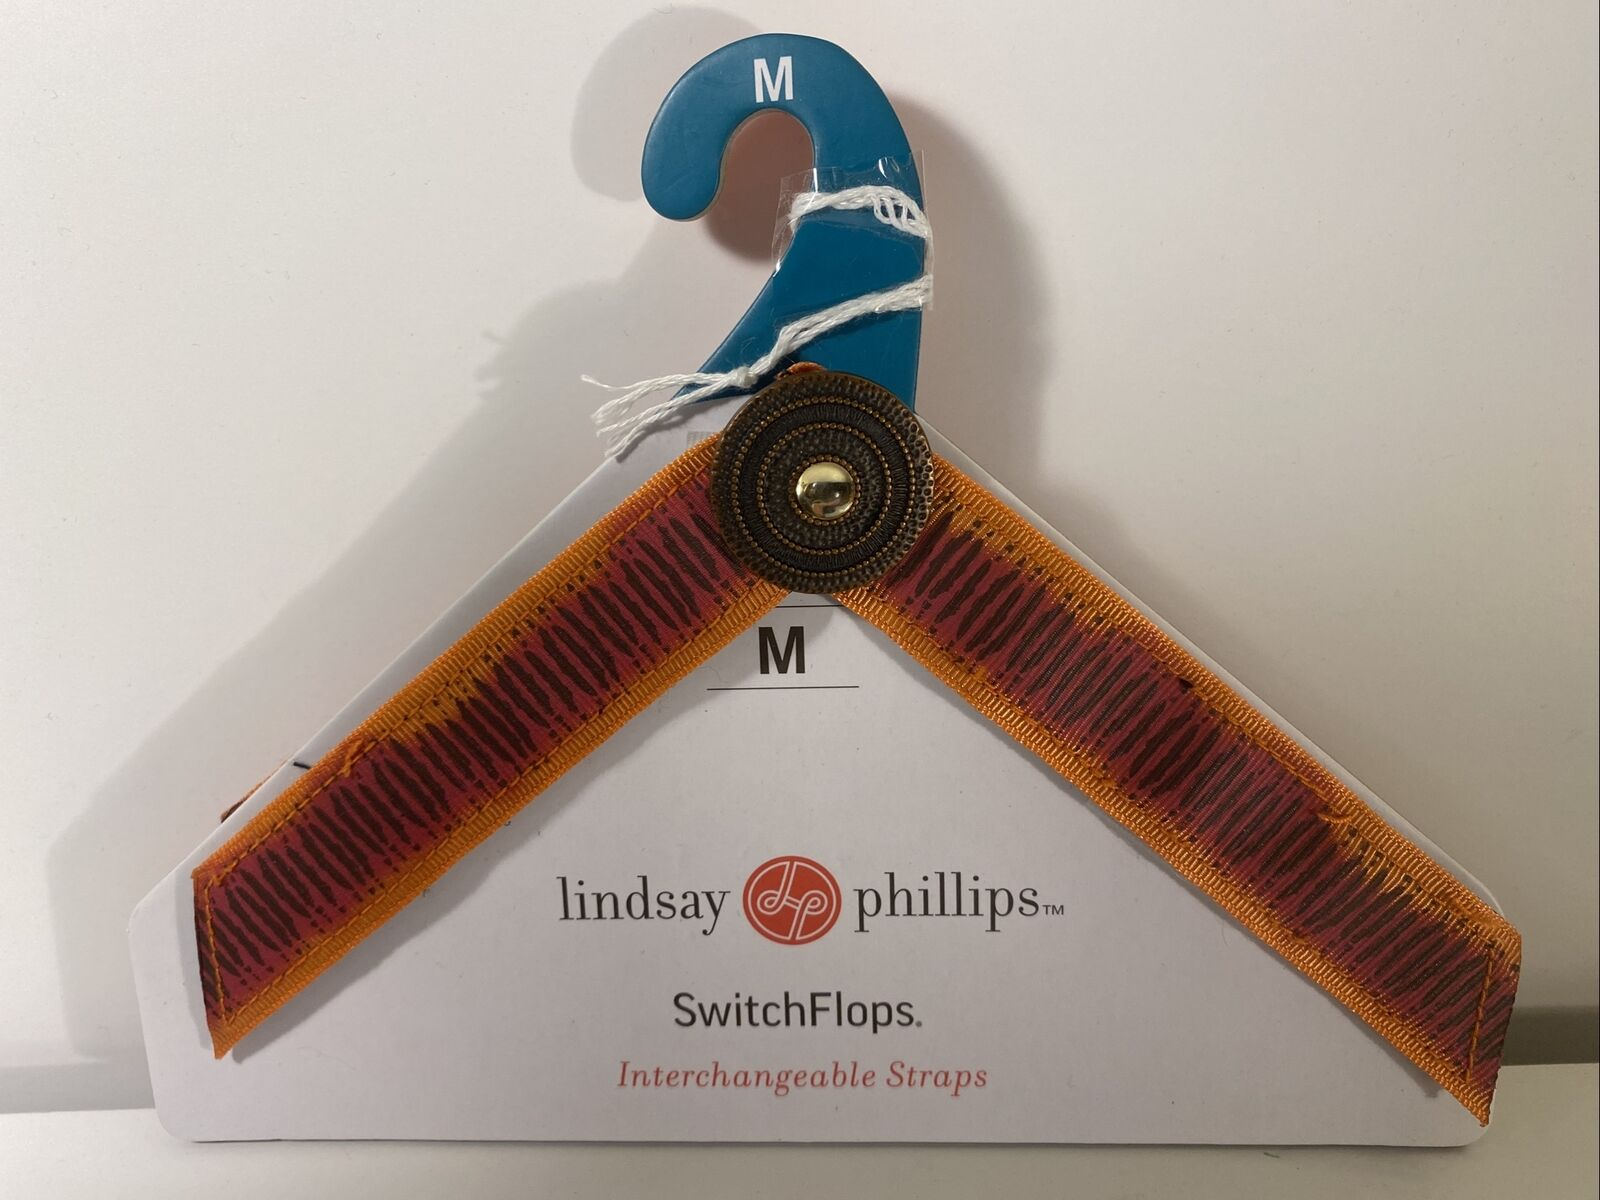 "NEW Lindsay Phillips SwitchFlops 7-8 Medium Interchangeable Straps ""Lorrena"""